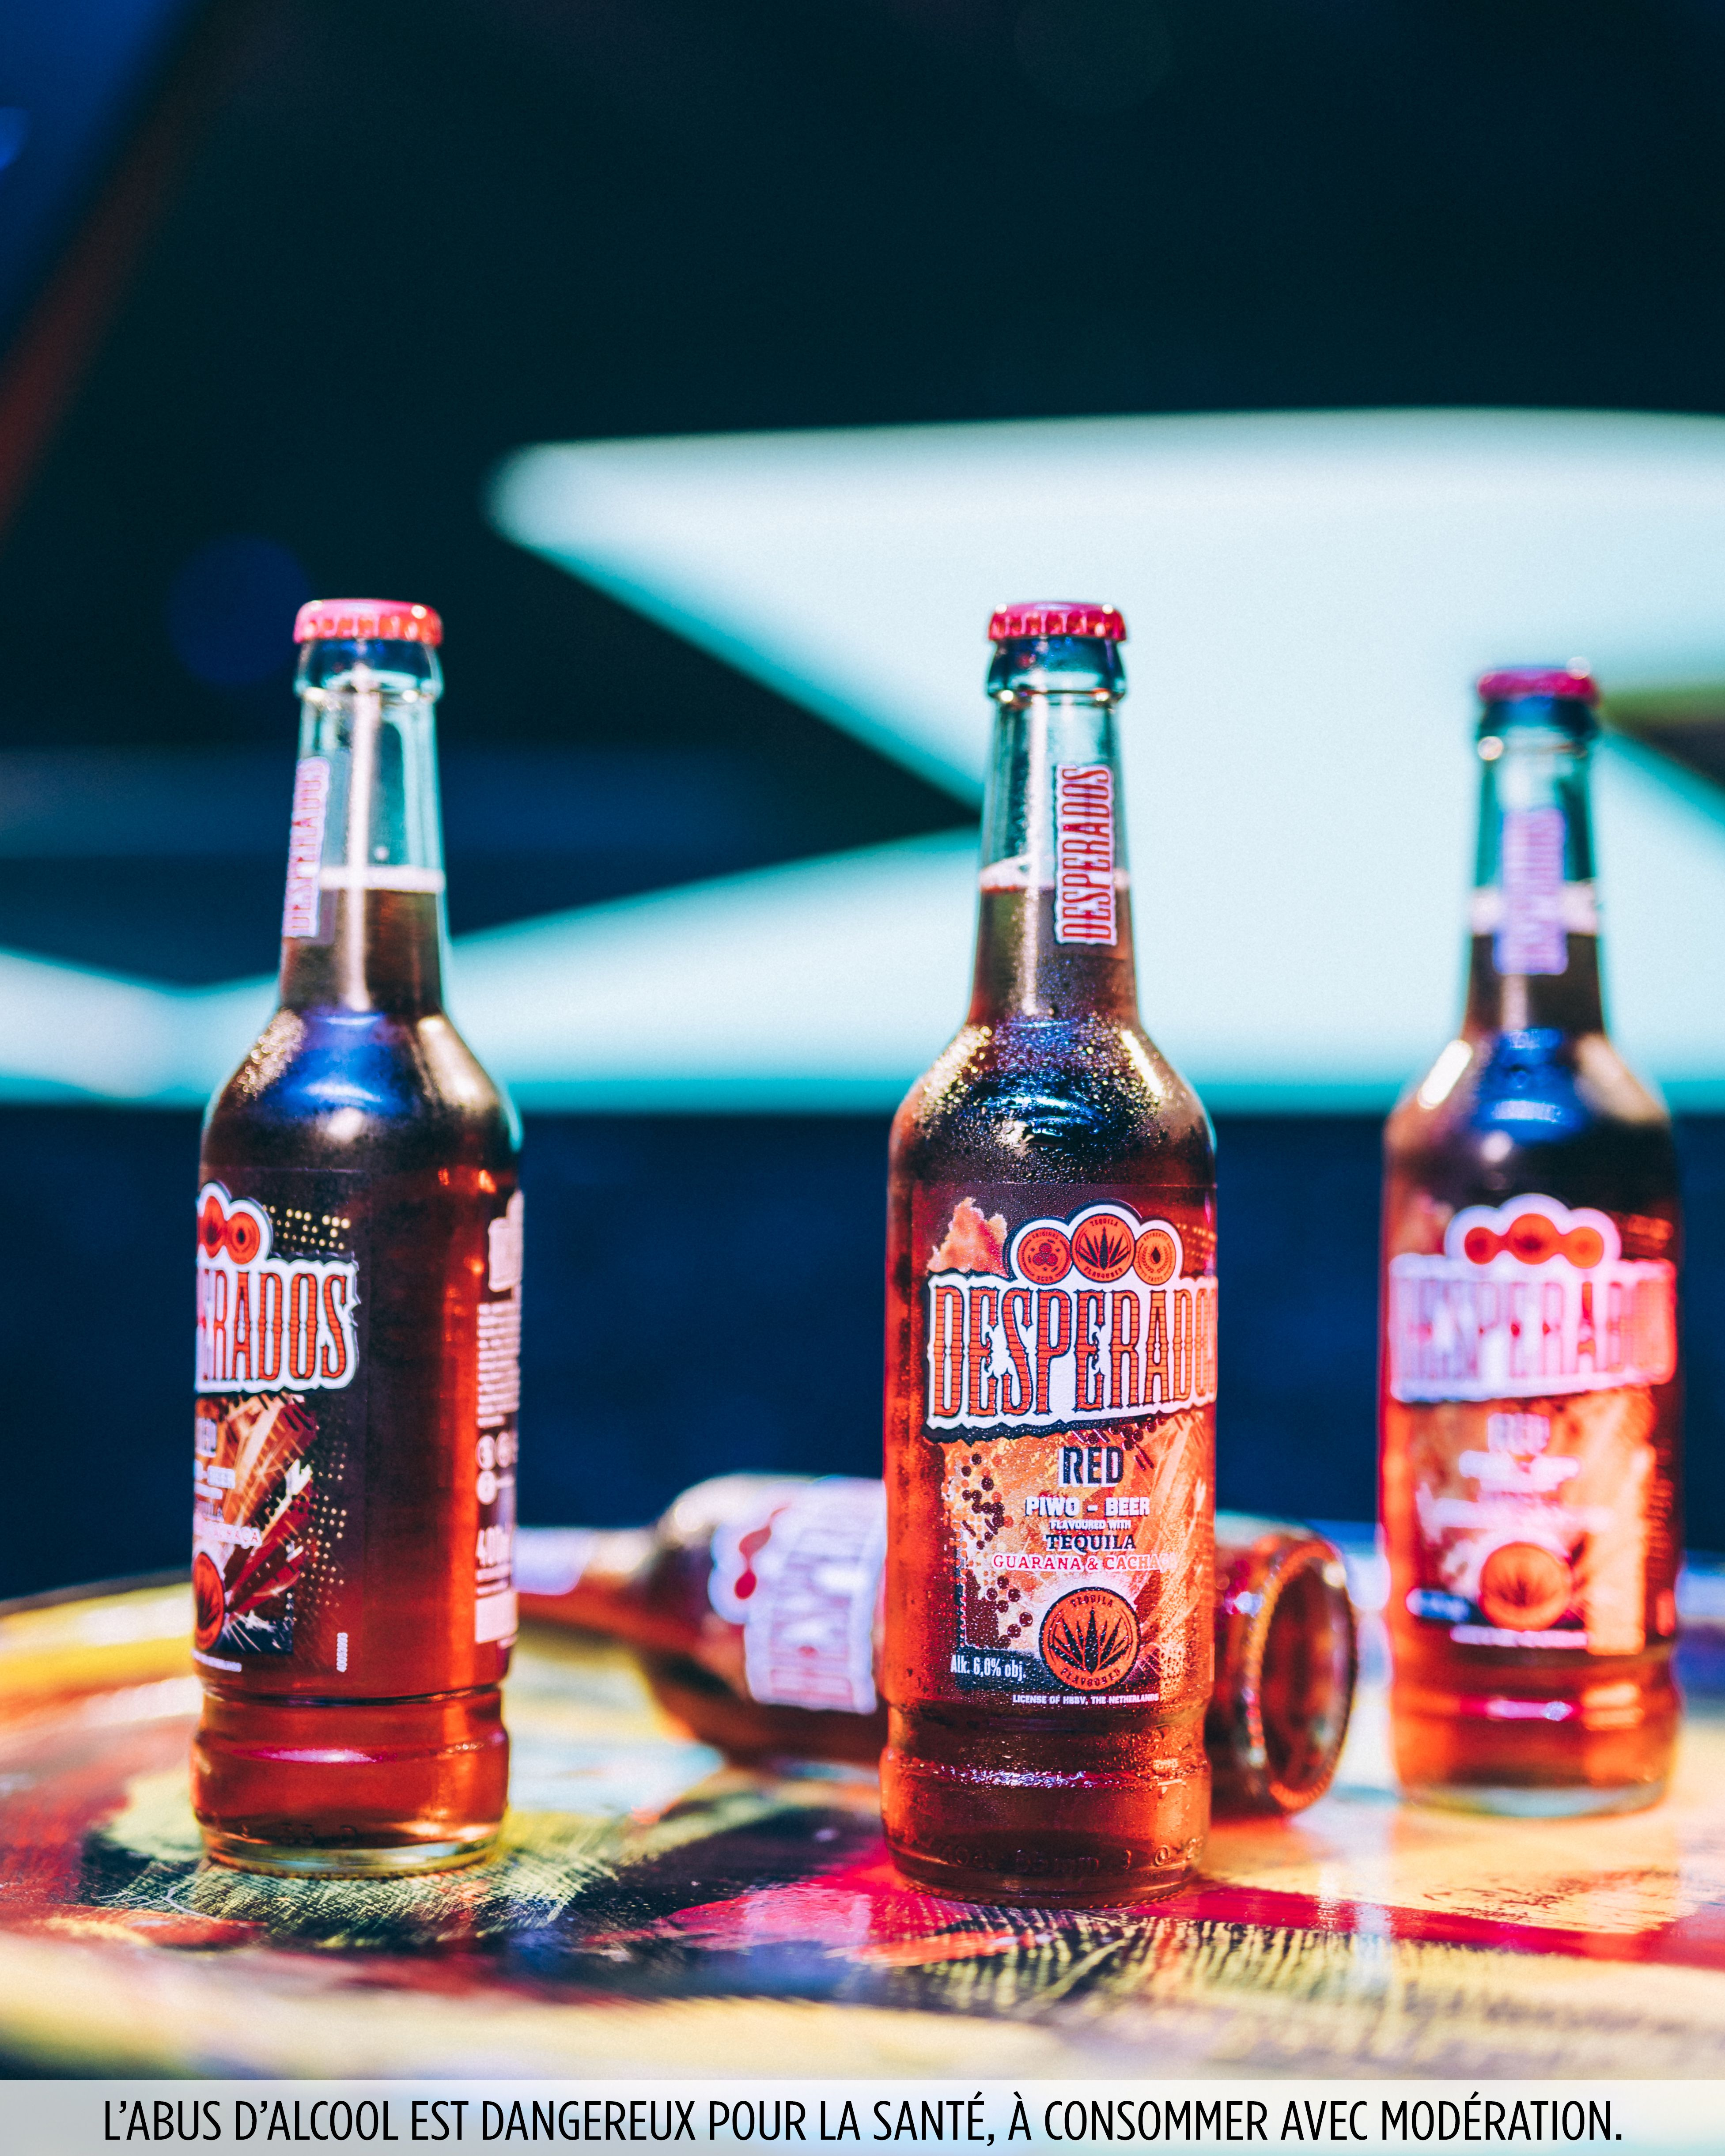 Biere Red Aromatisee Tequila Guarana Cachaca Desperados Le Pack De 6 Bouteilles De 33cl A Prix Carrefour En 2020 Tequila Cachaca Bouteille